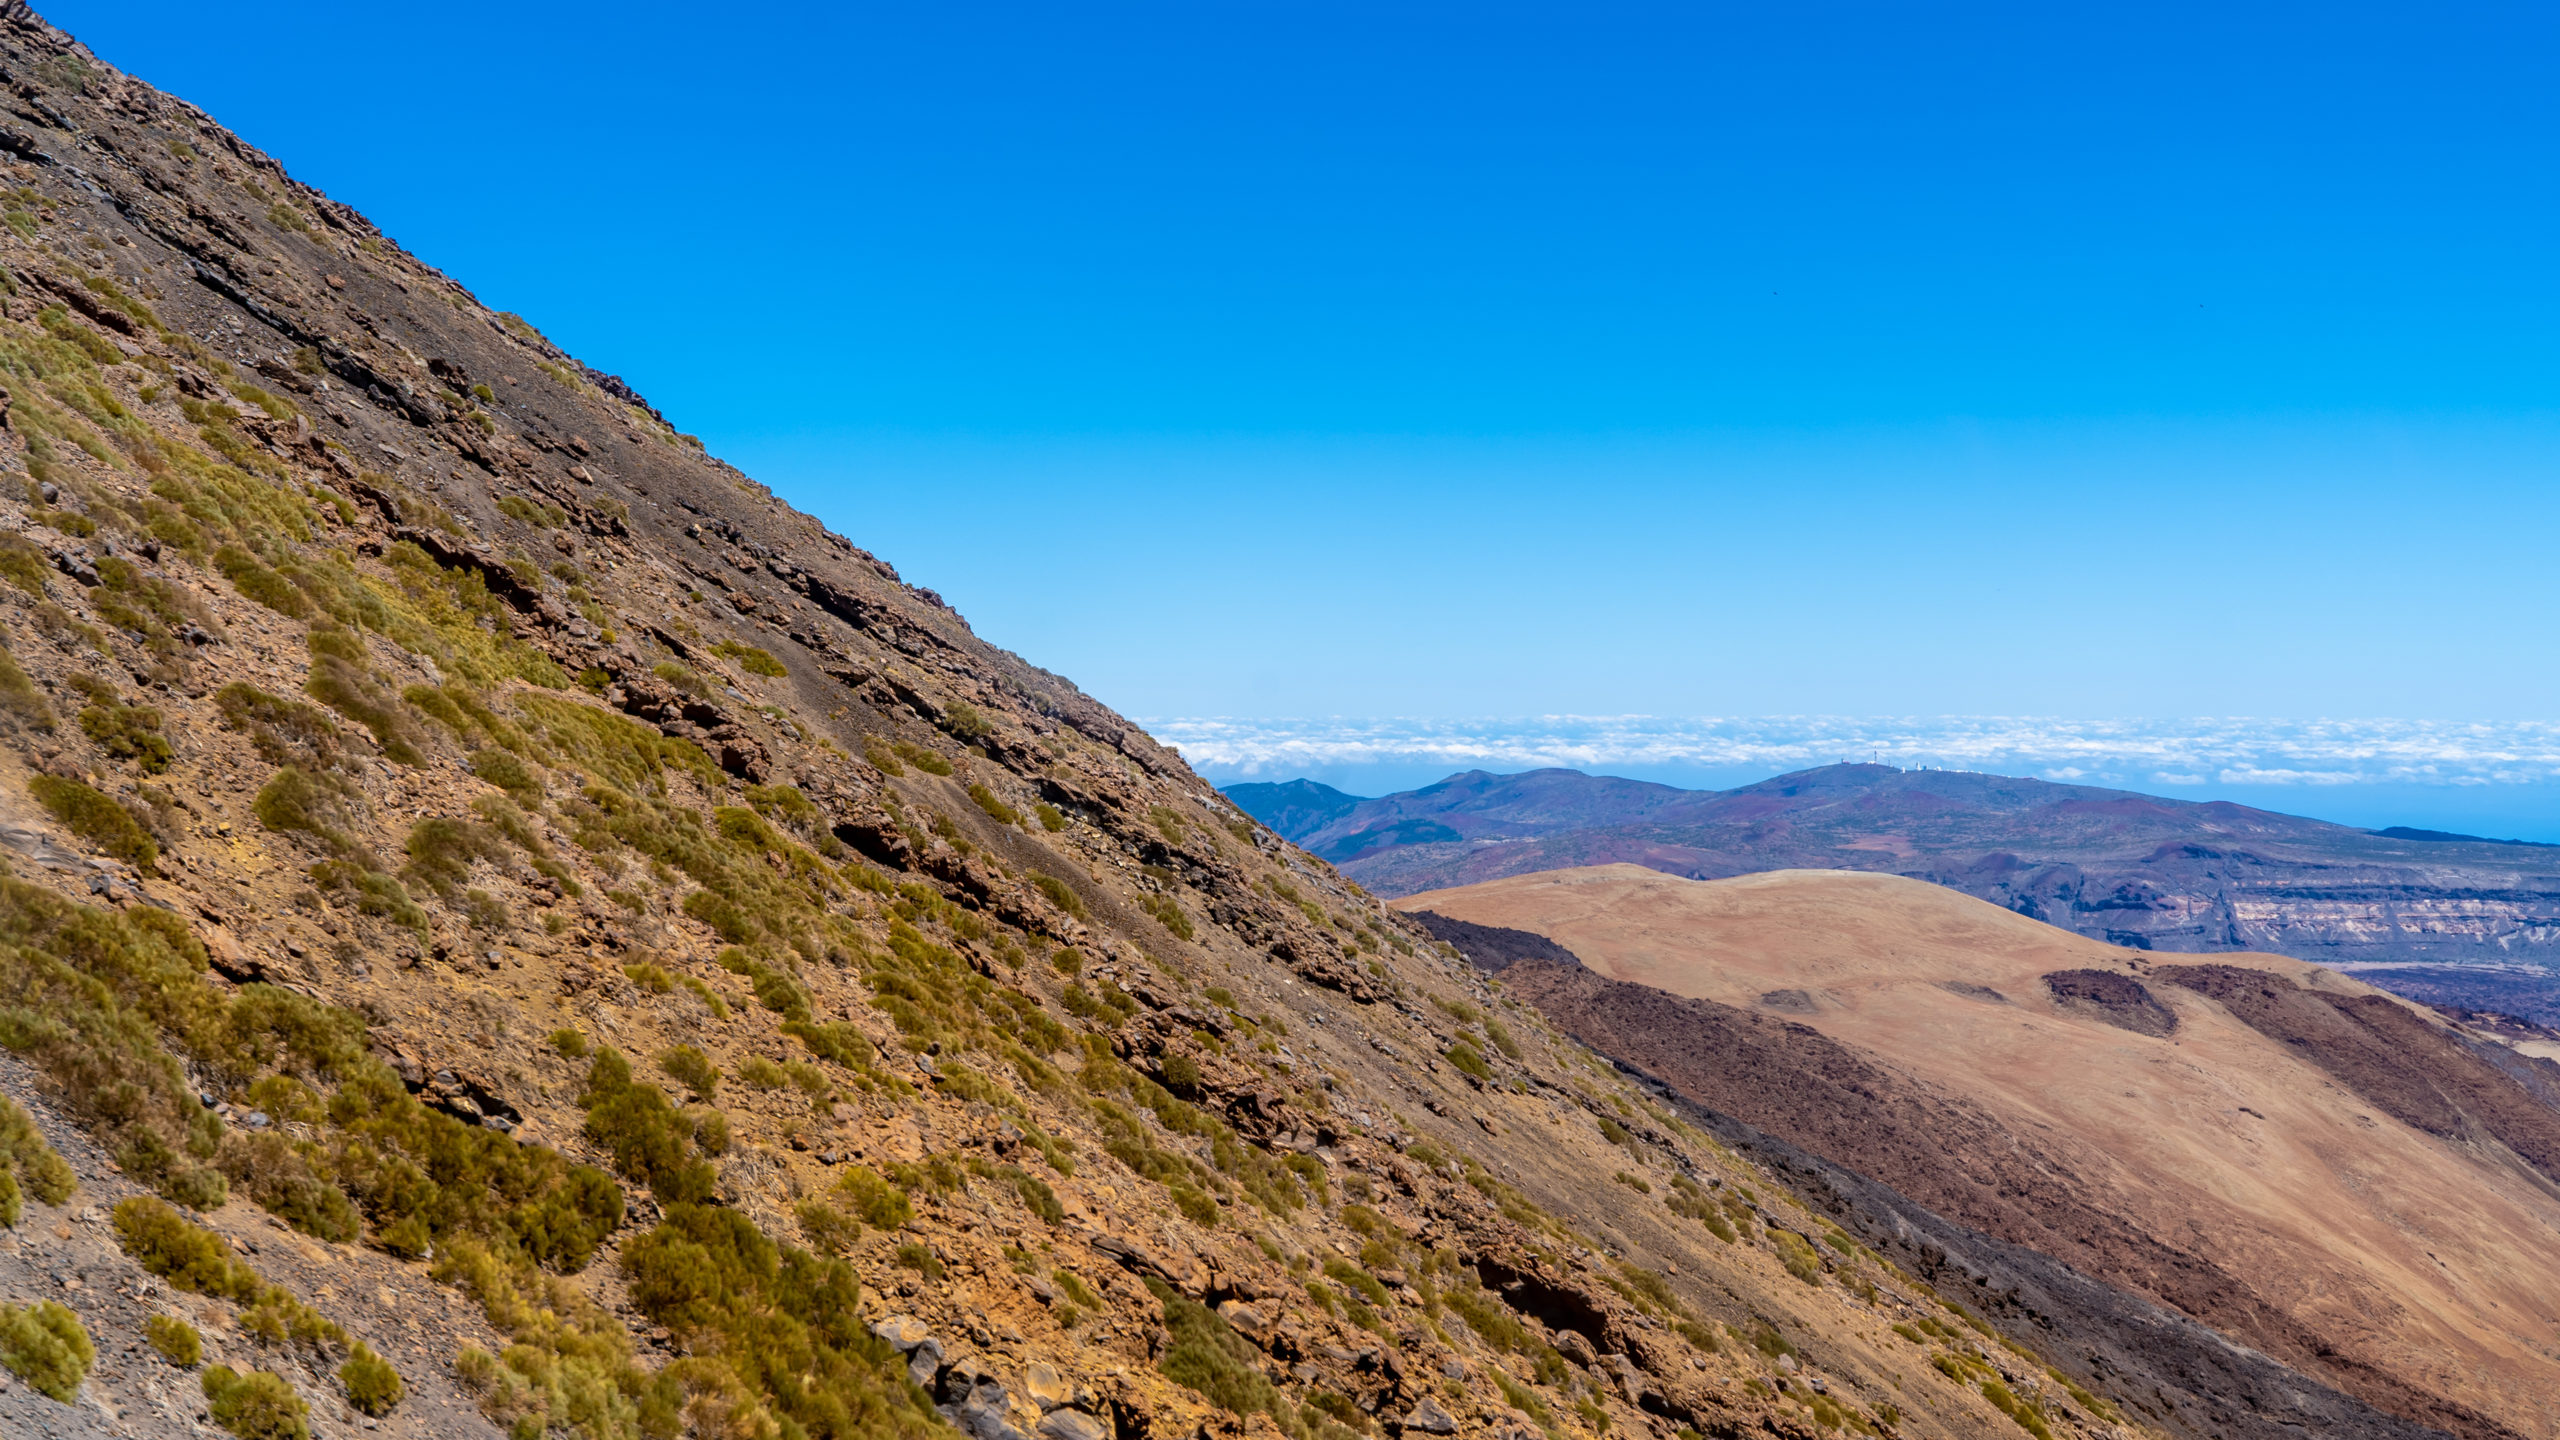 Atlantik, Teneriffa, Pico del Teide in 3500 Meter Höhe